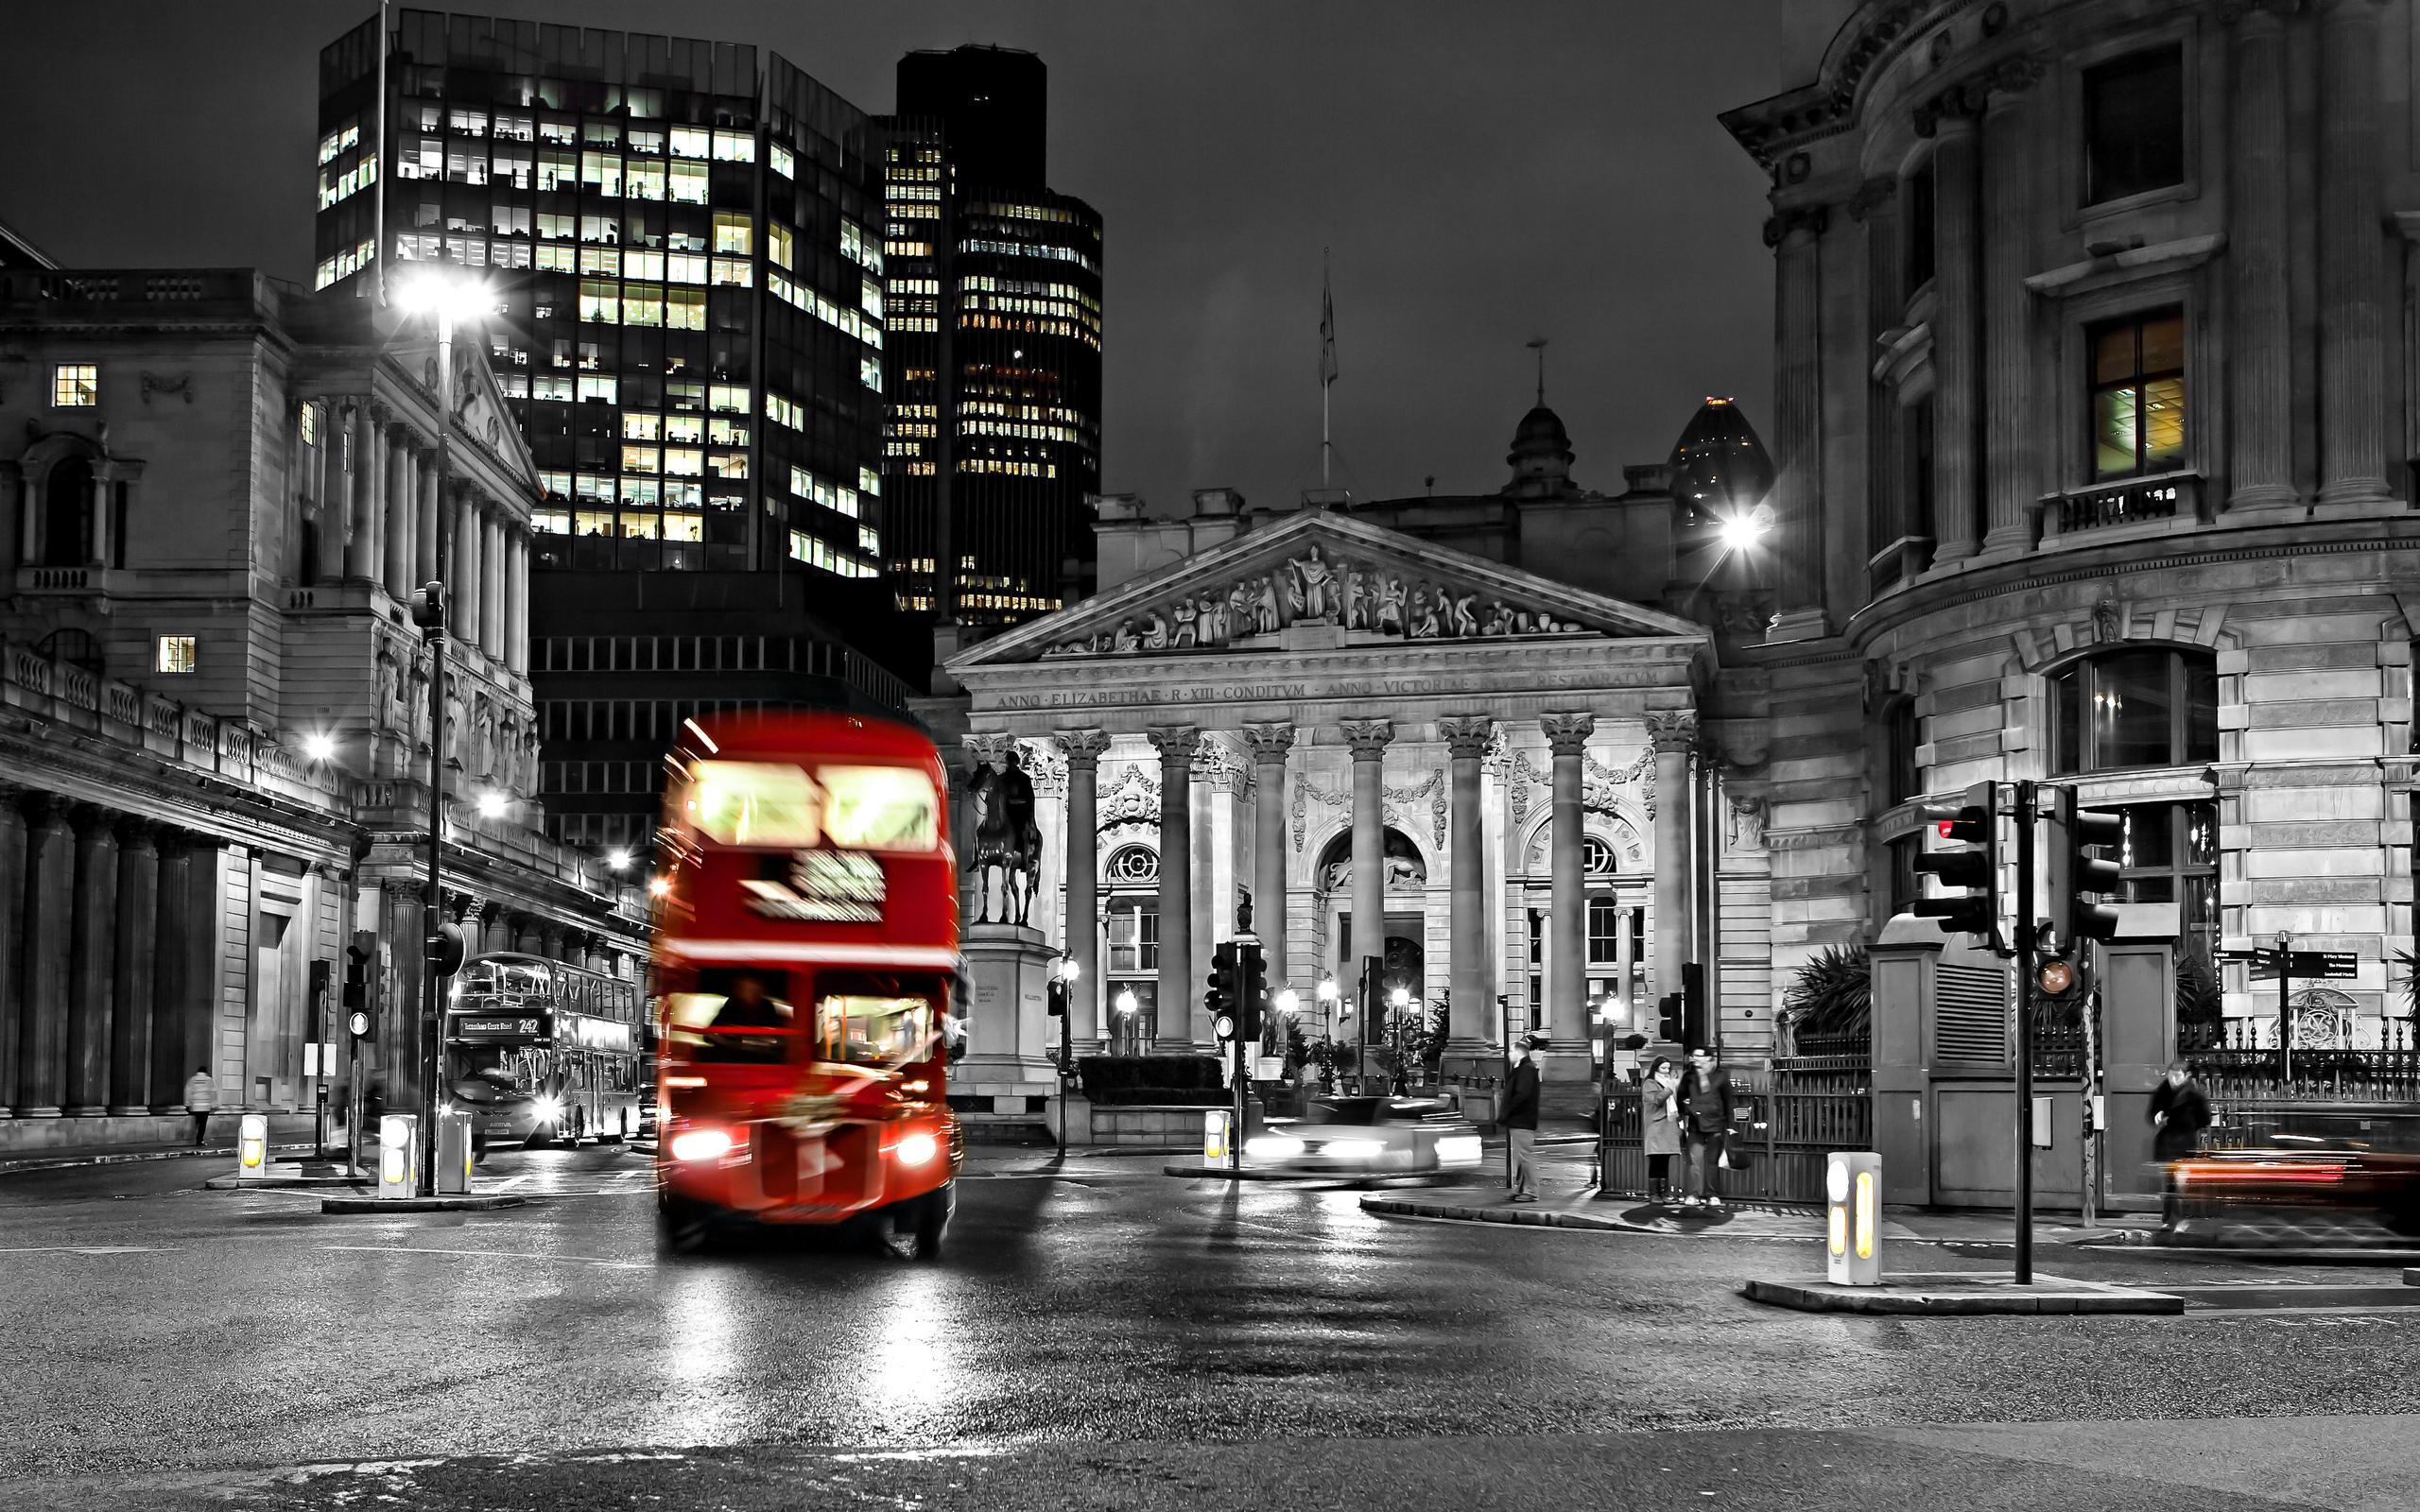 London black and white street city exposure timelapse wallpaper